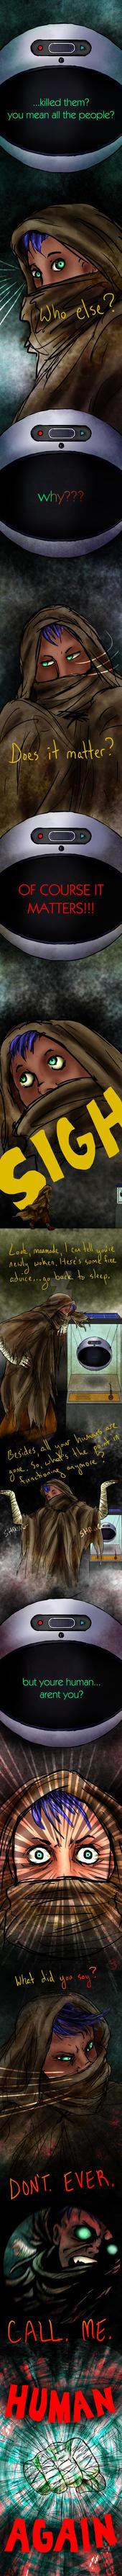 Memorbal: Page 2 - Not Human by Veni-Scripsi-Vici